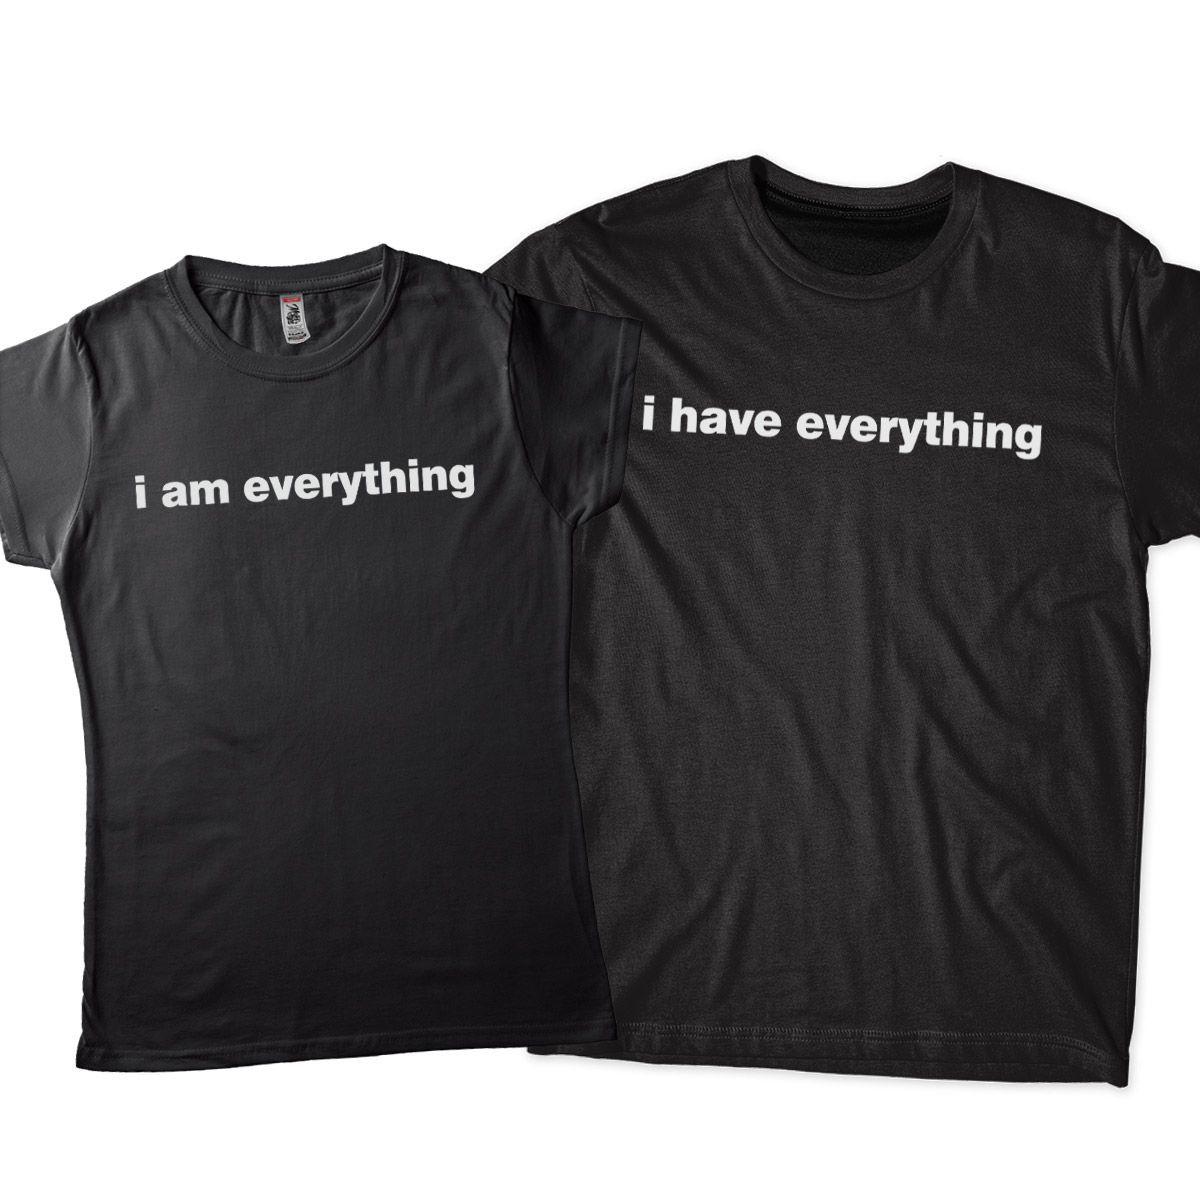 blusas para casal usar juntos have everything